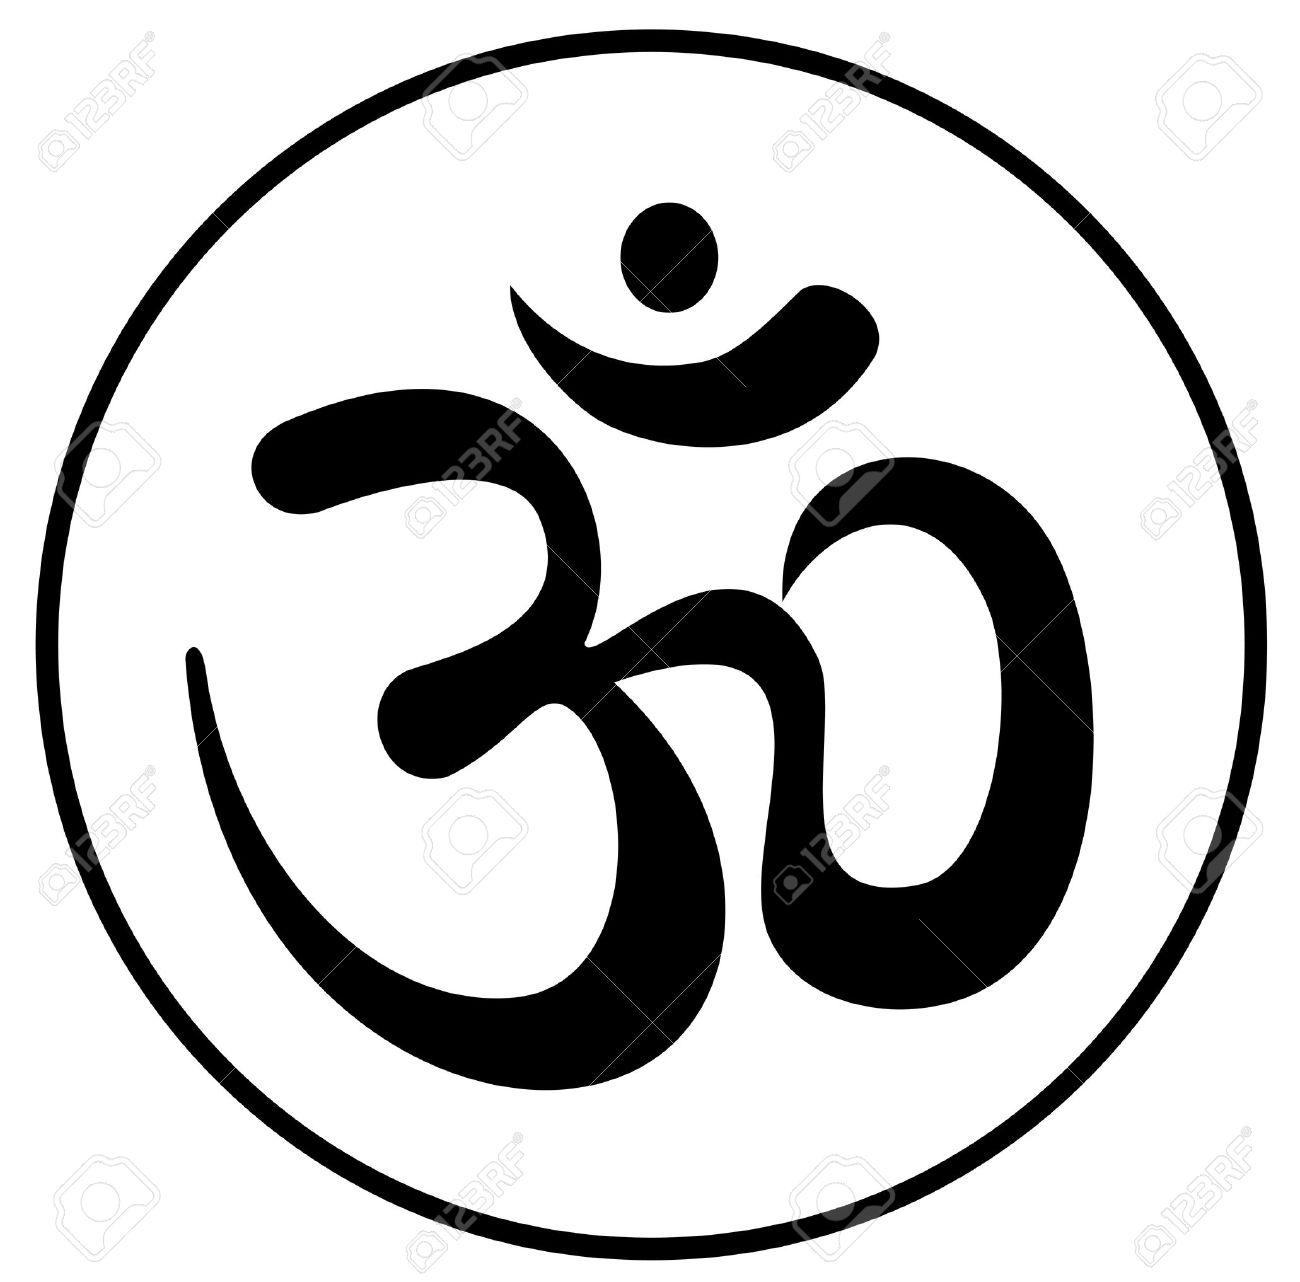 Buddhist Tattoo Symbols Images For Tatouage